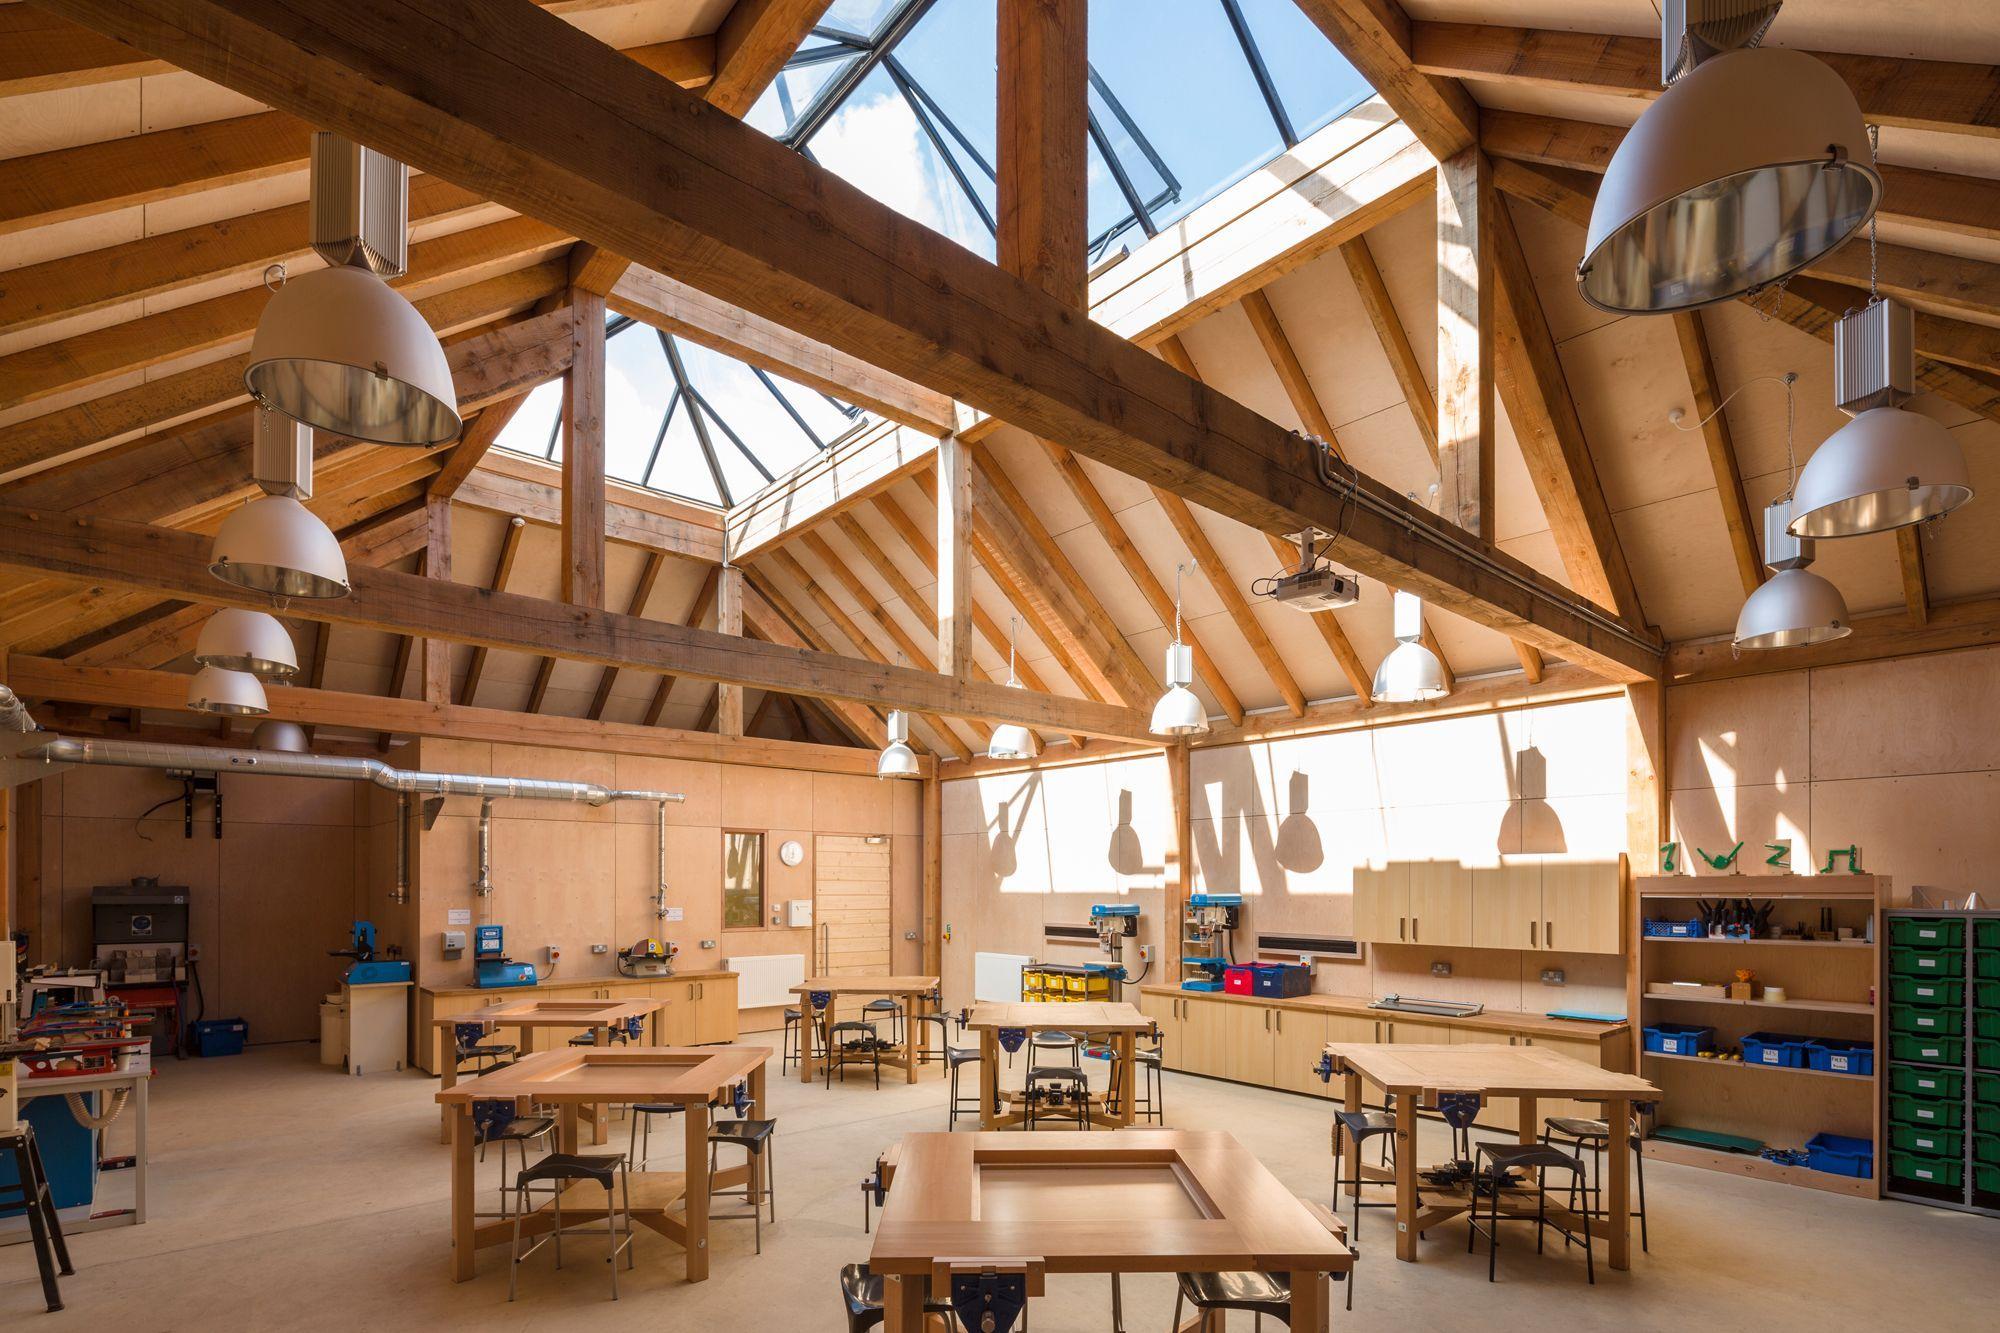 Foto ギャレガードナー Rustikale伝統werkstattbauにsudengland Wood Workshop Architecture In 2020 Workshop Architecture Traditional Building Timber Frame Building